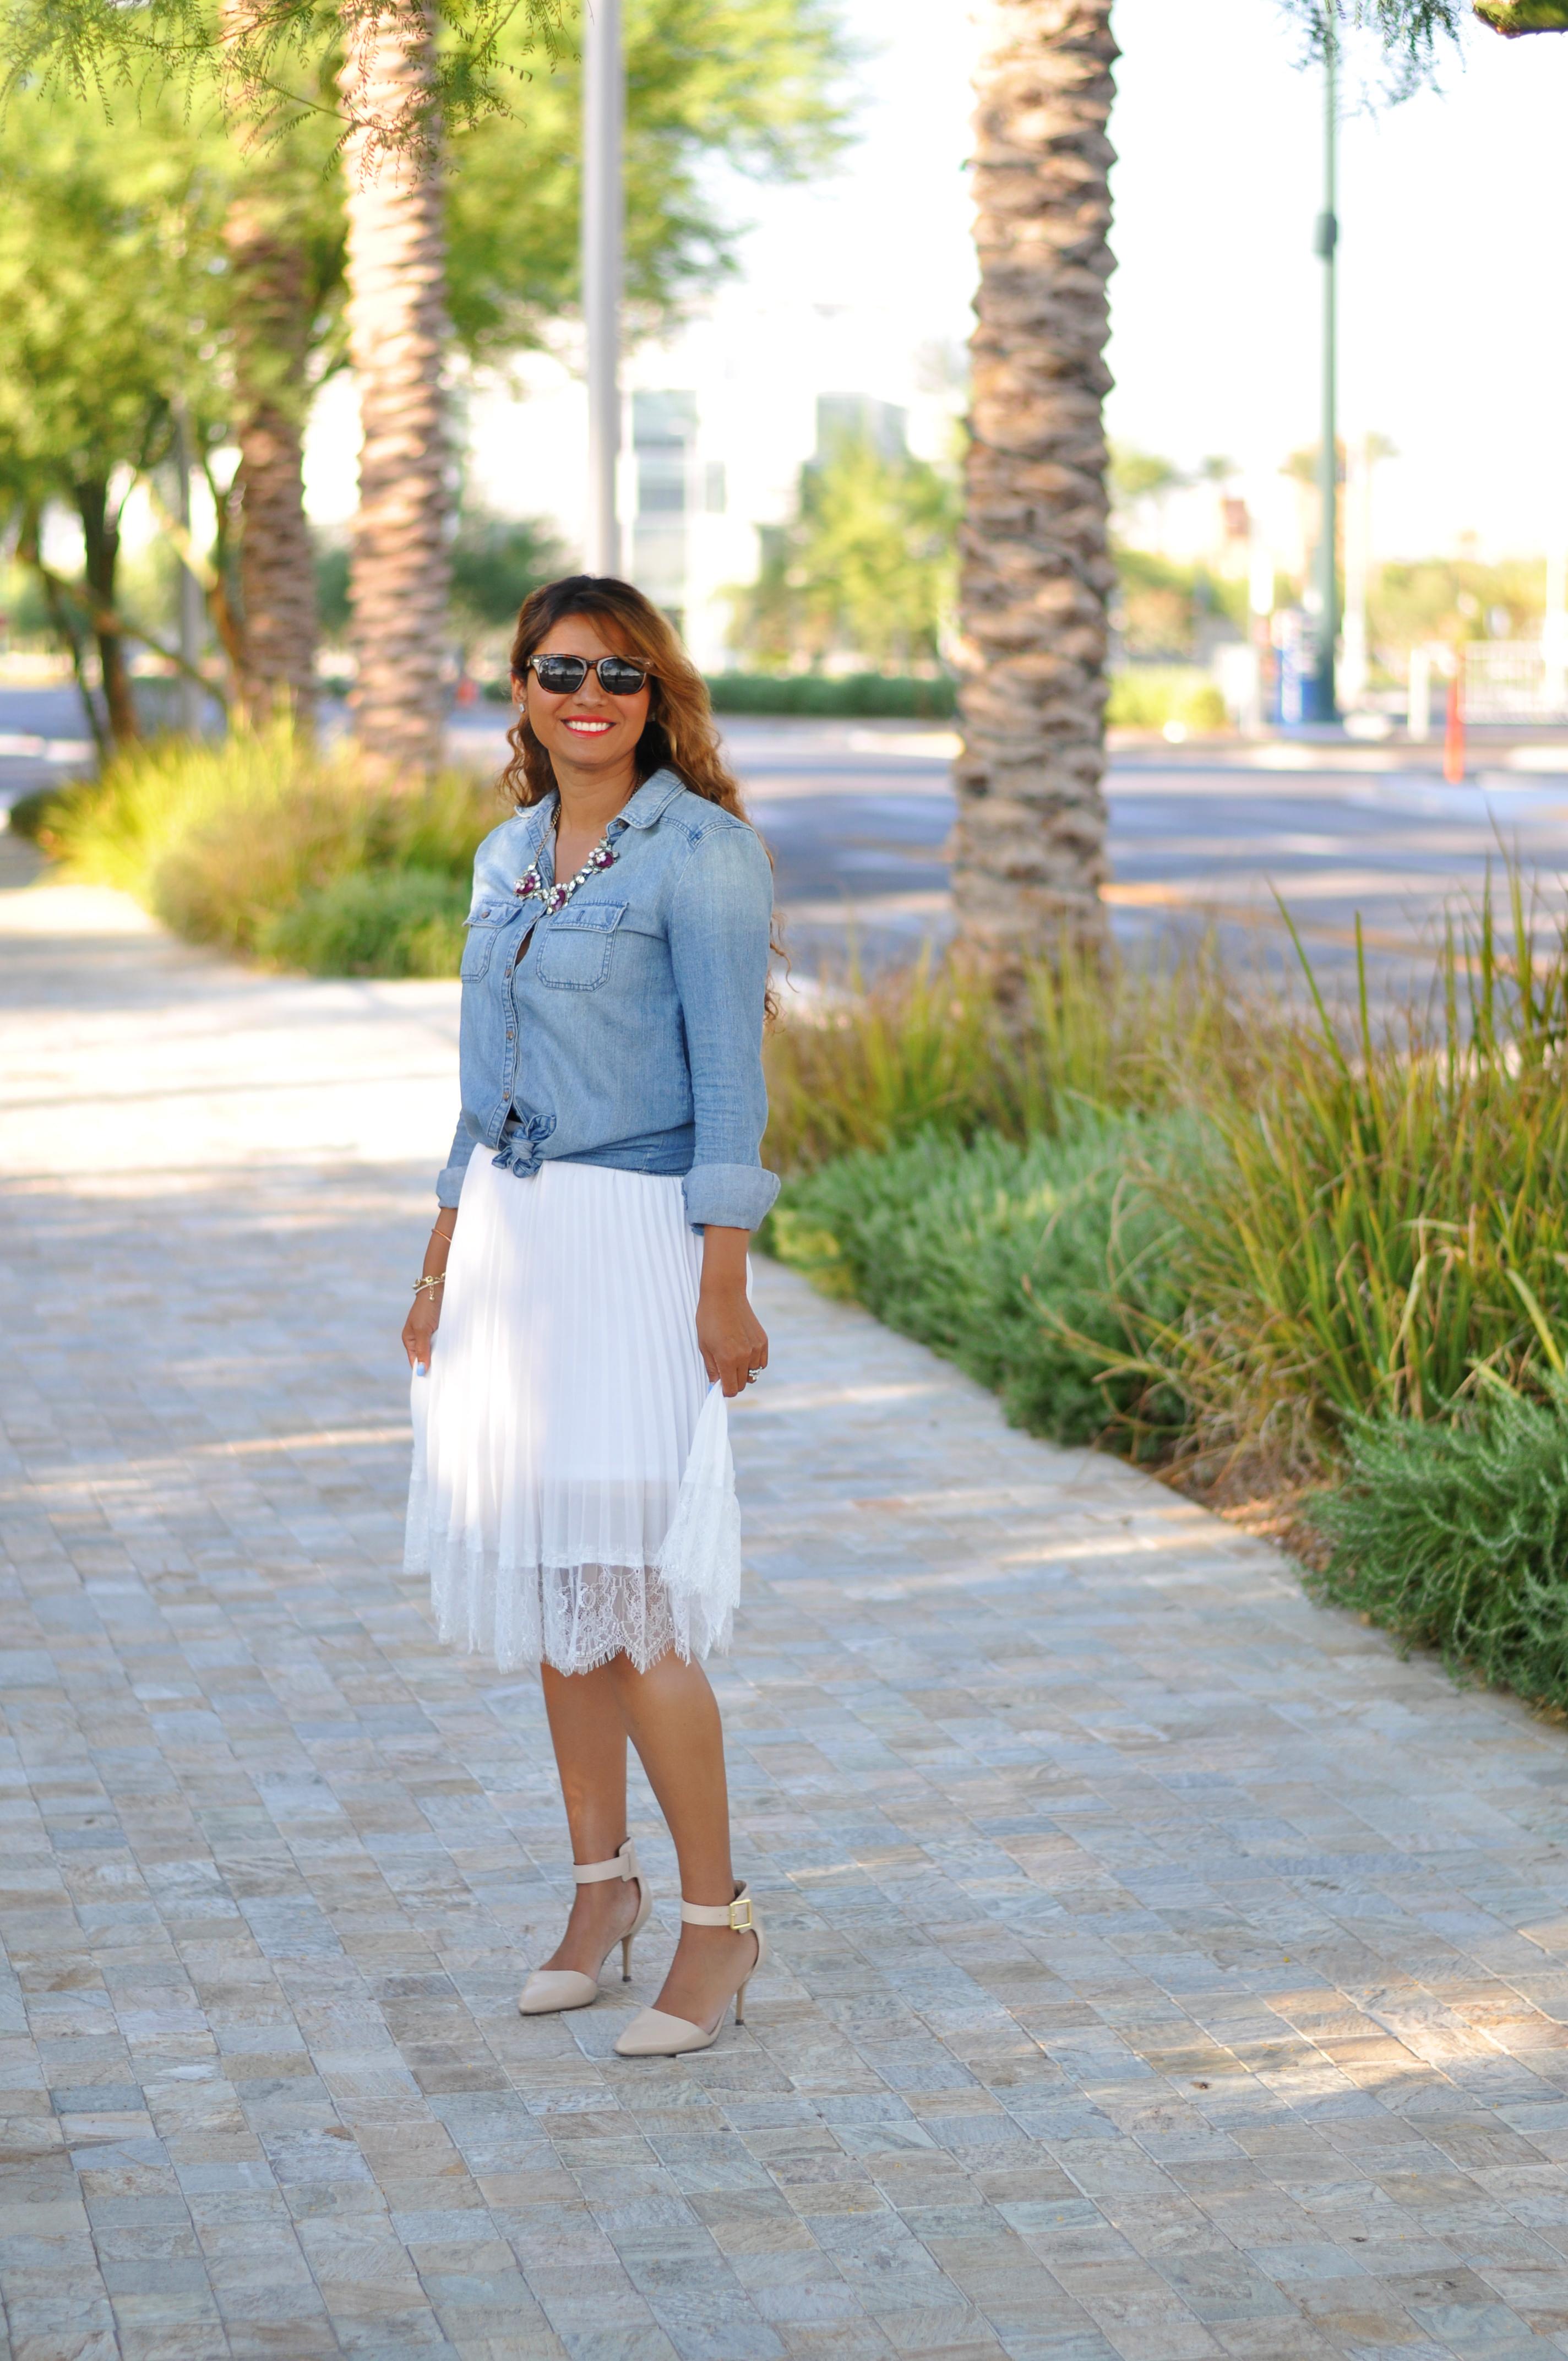 Denim Shirt And Flirty White Skirt Uptown Fashion By Jess